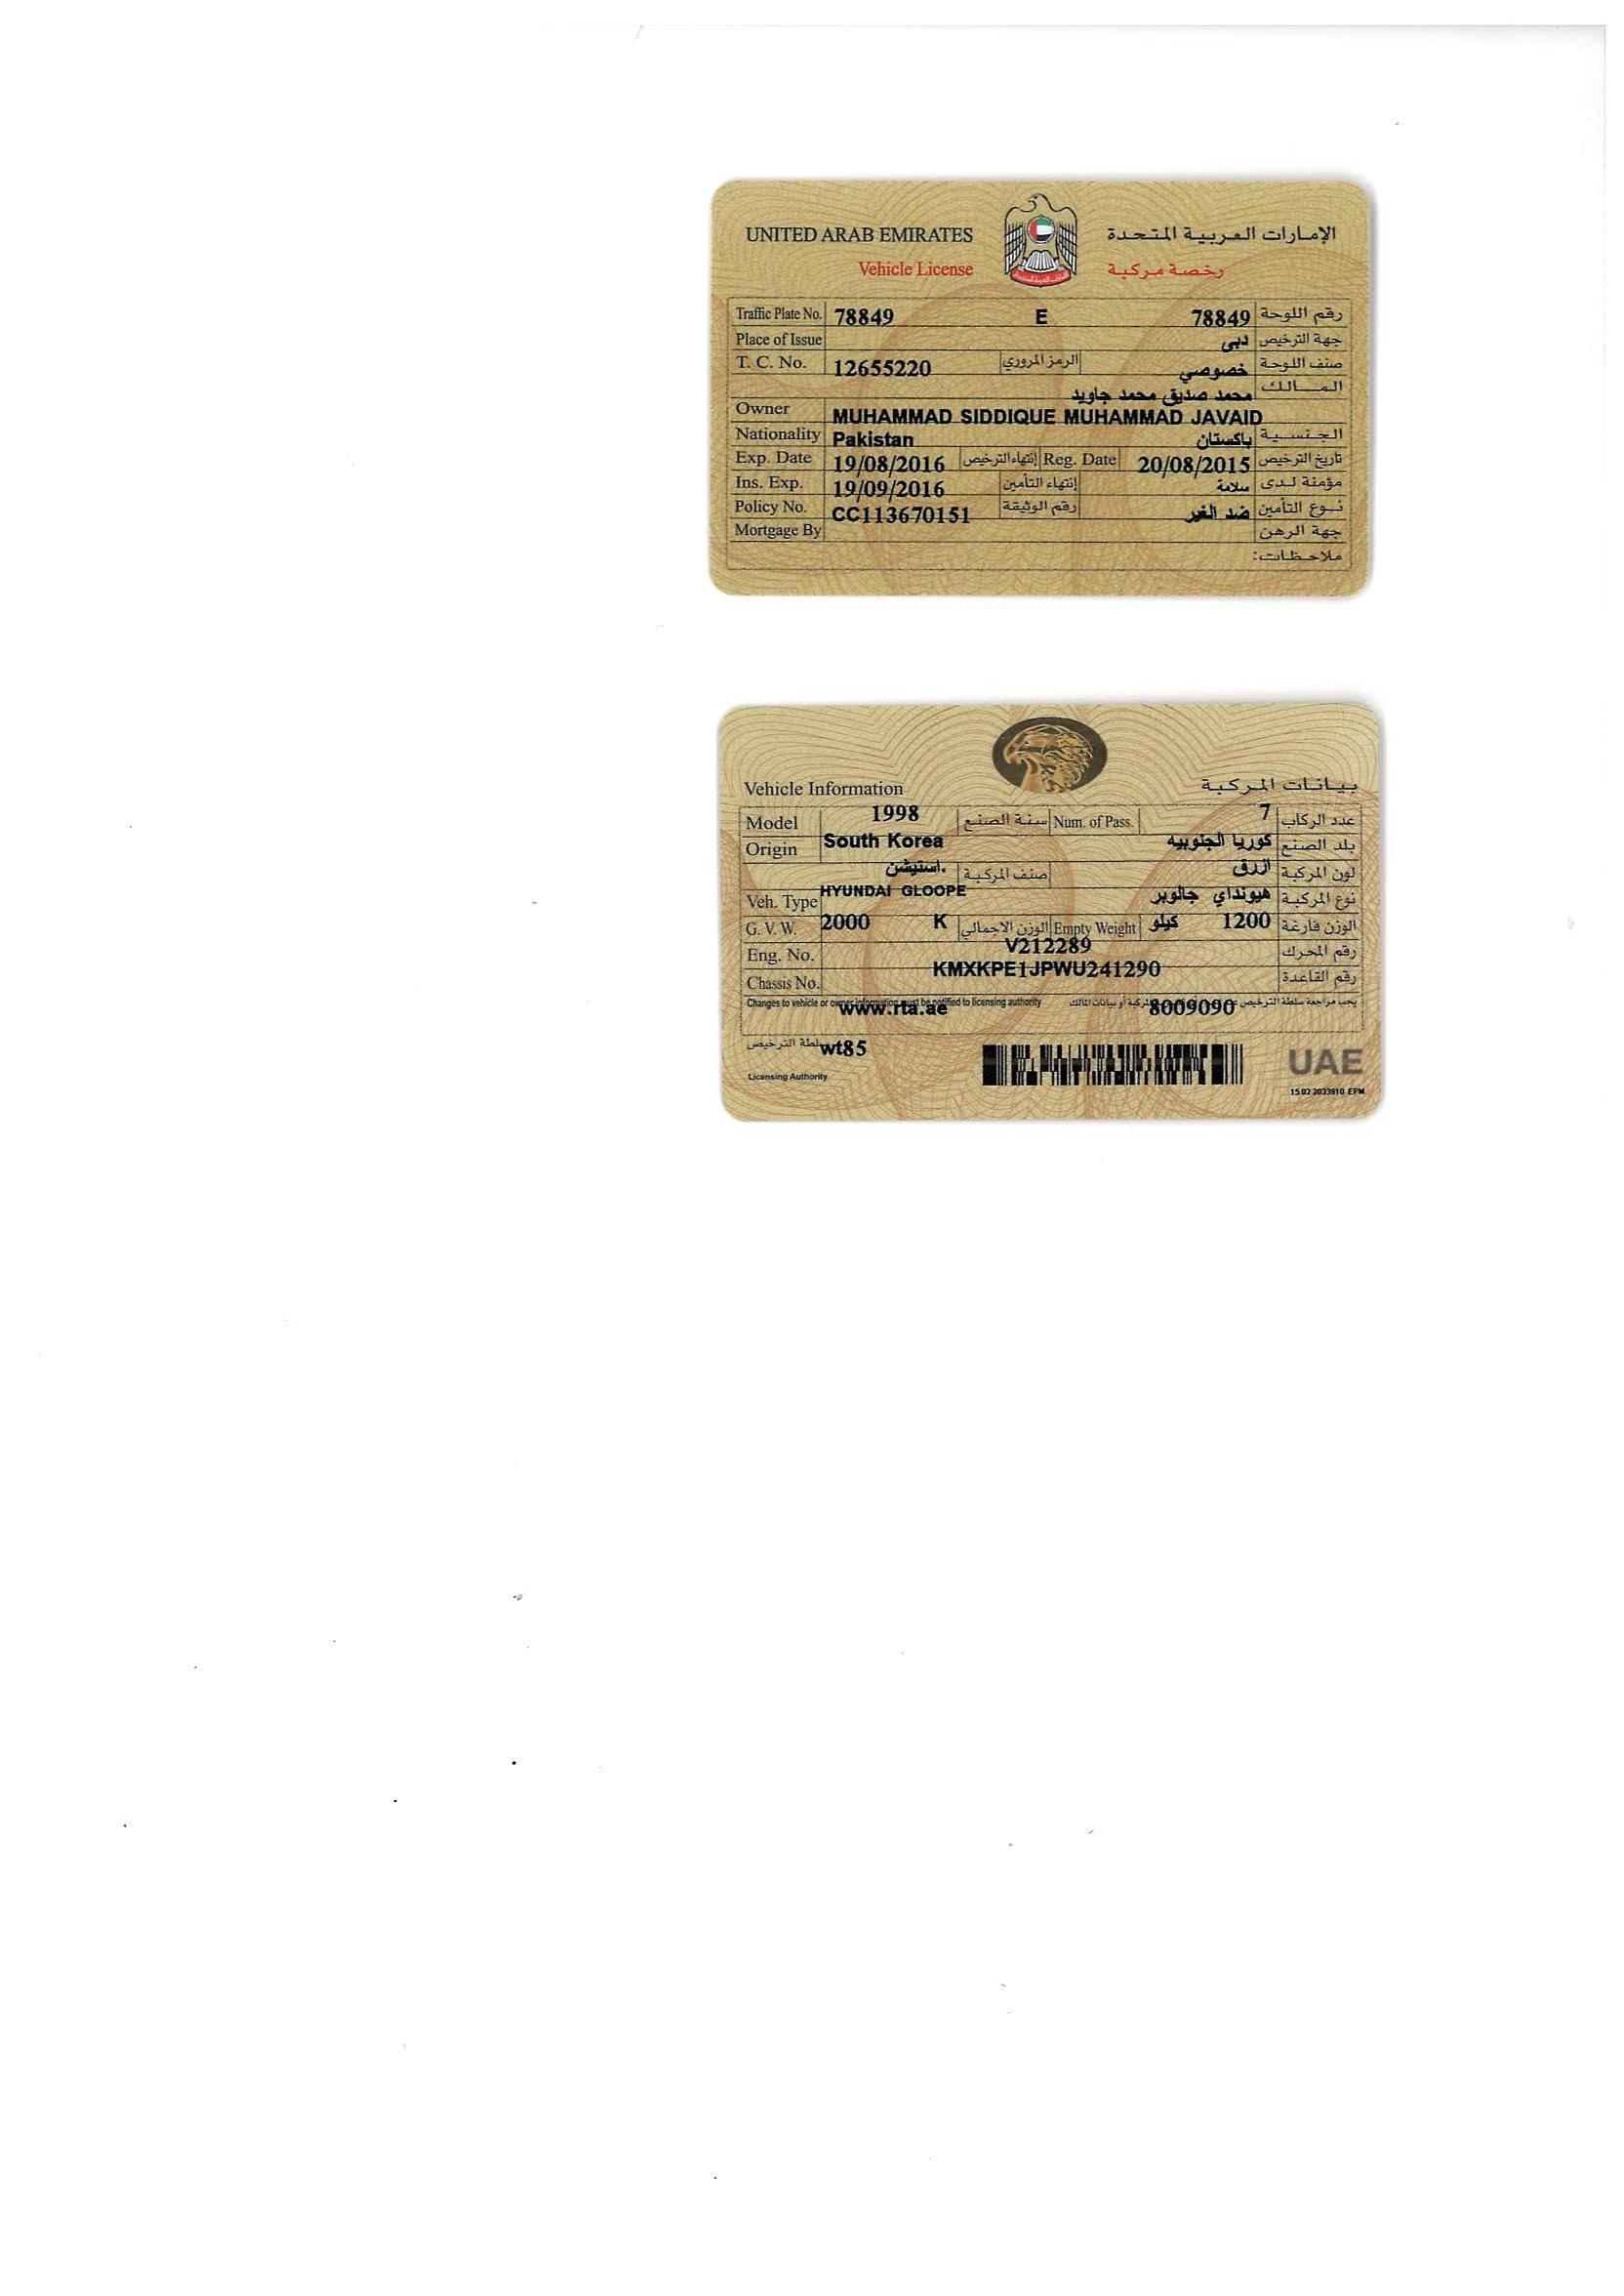 hyundai registration.jpg